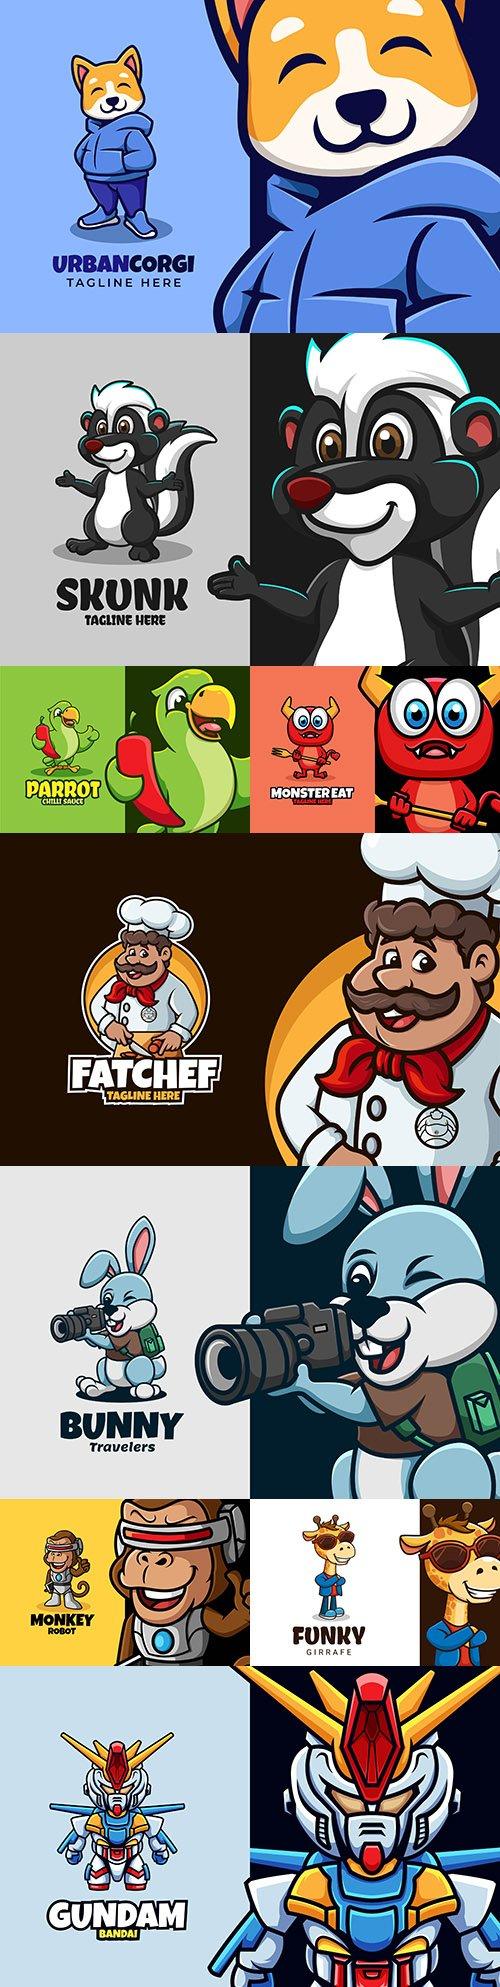 Emblem mascot and brand name logos design 9